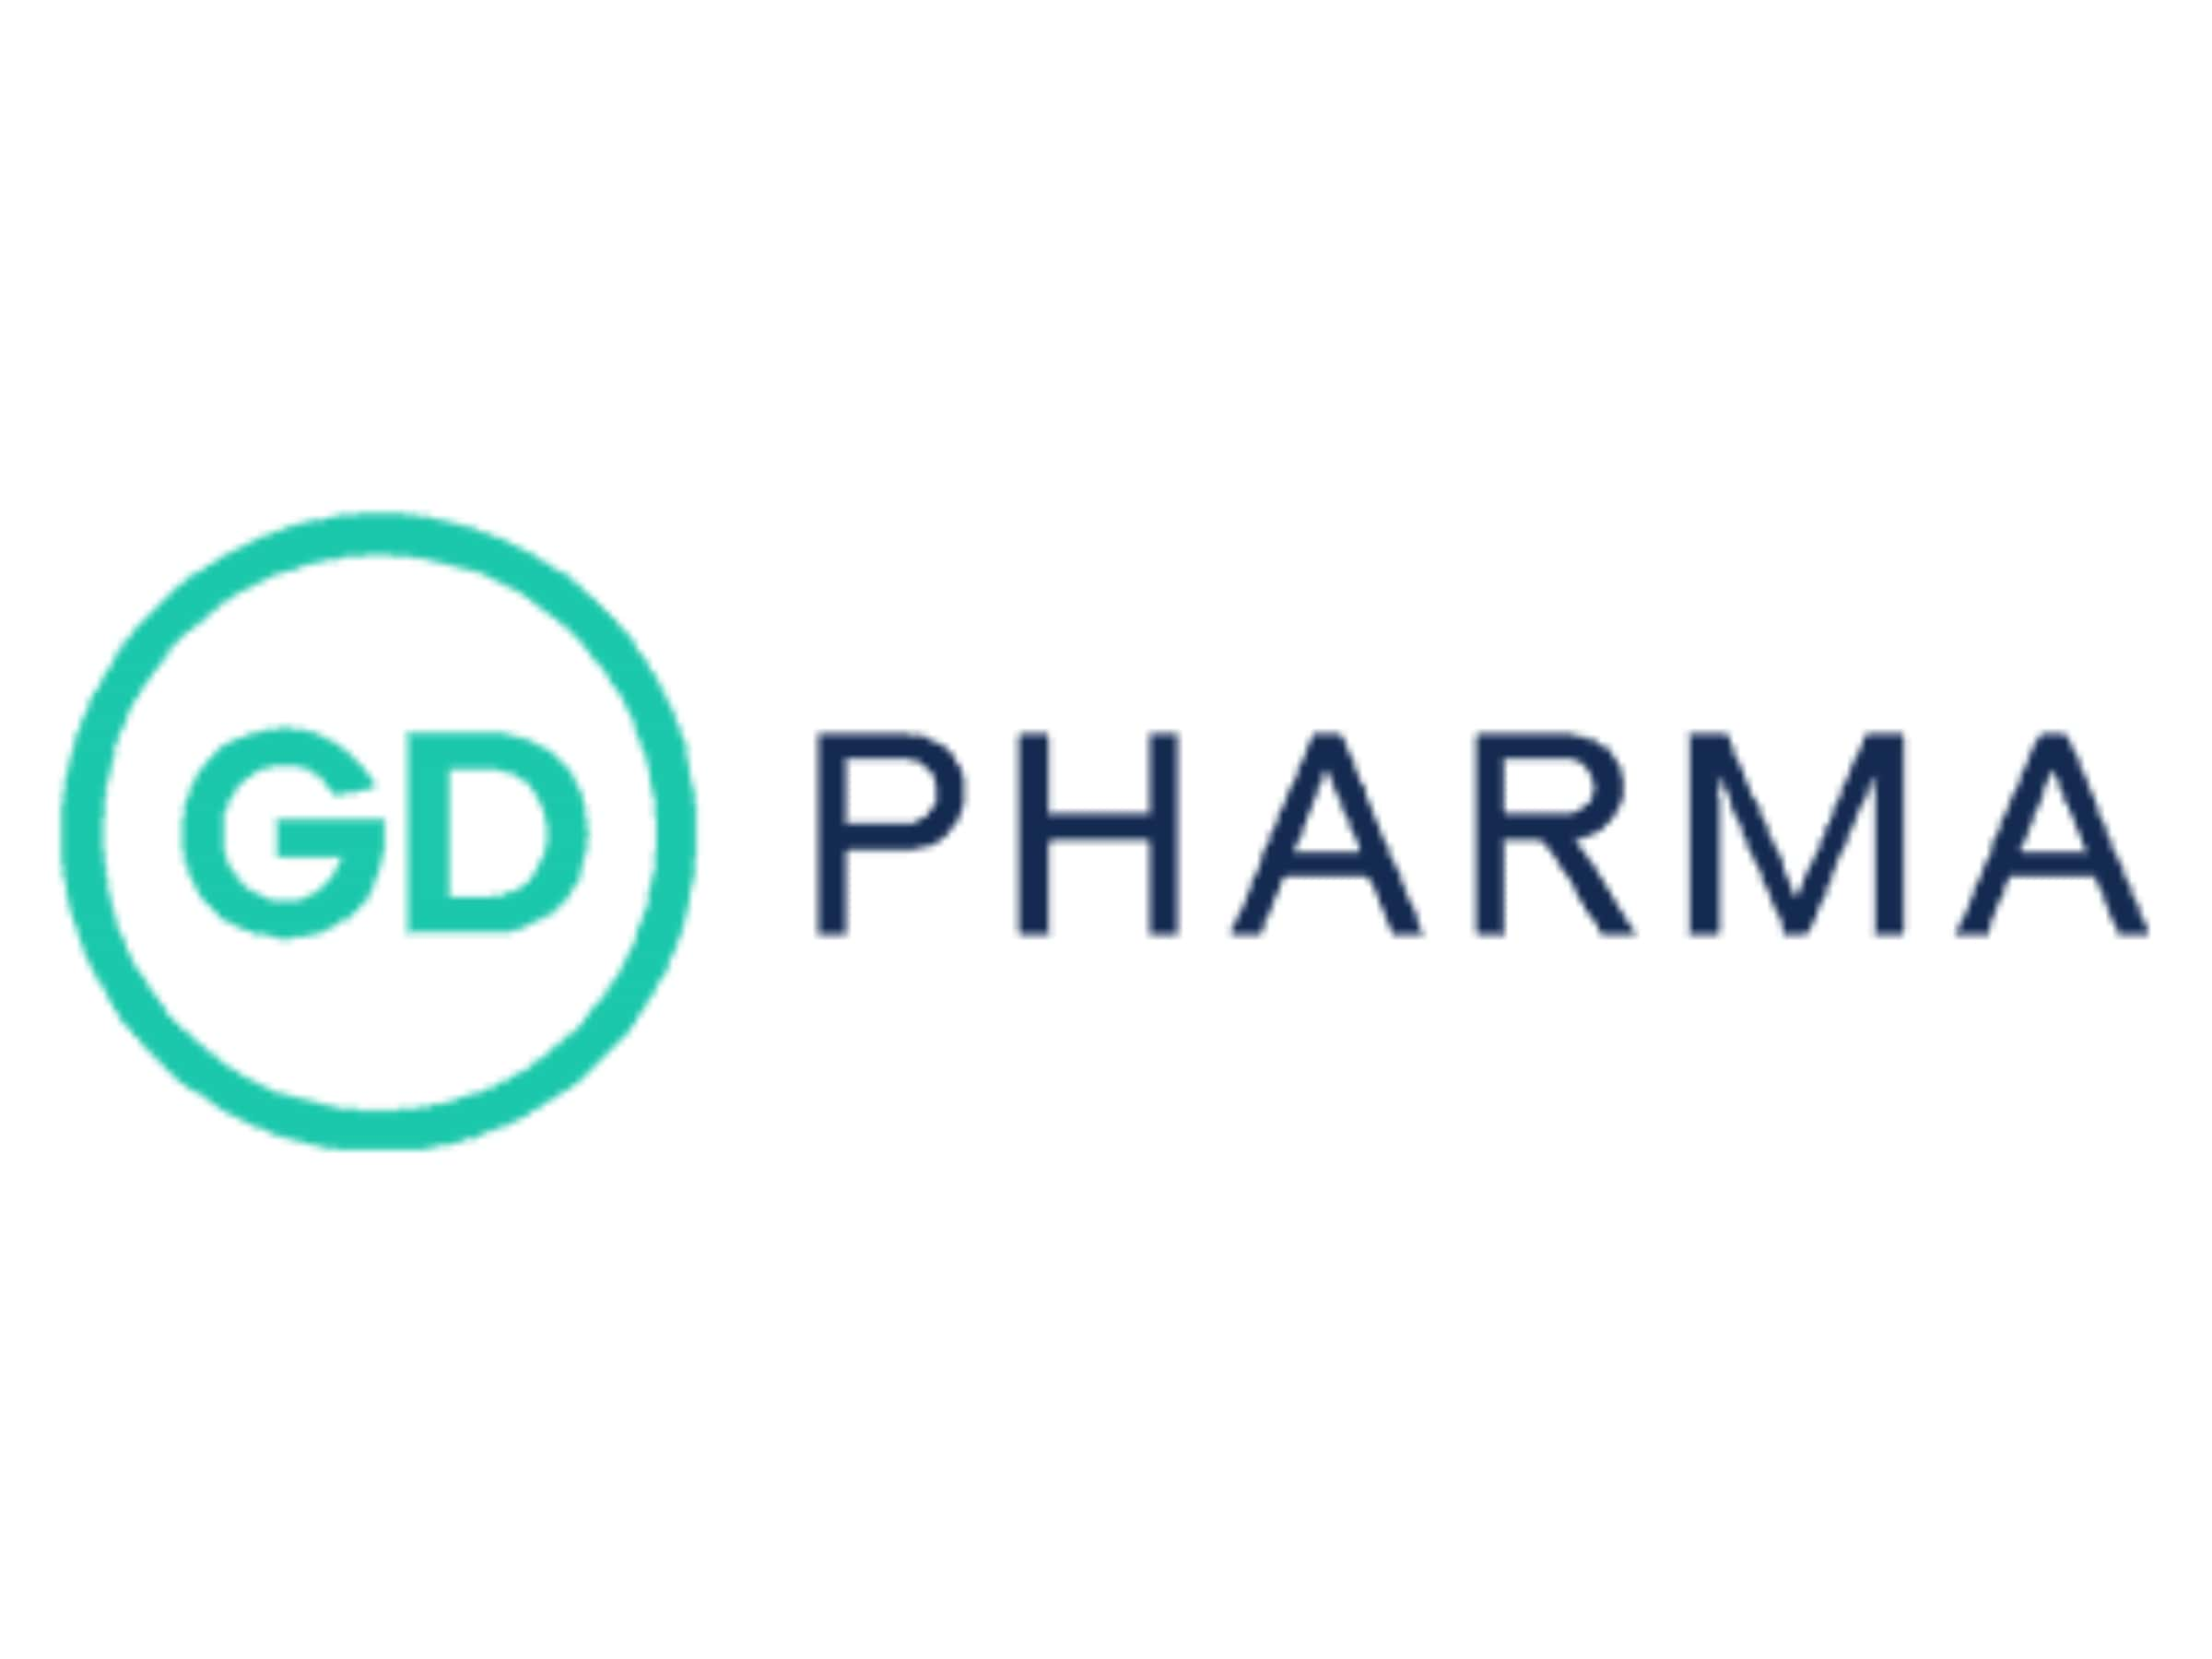 GD Pharma Pty Ltd